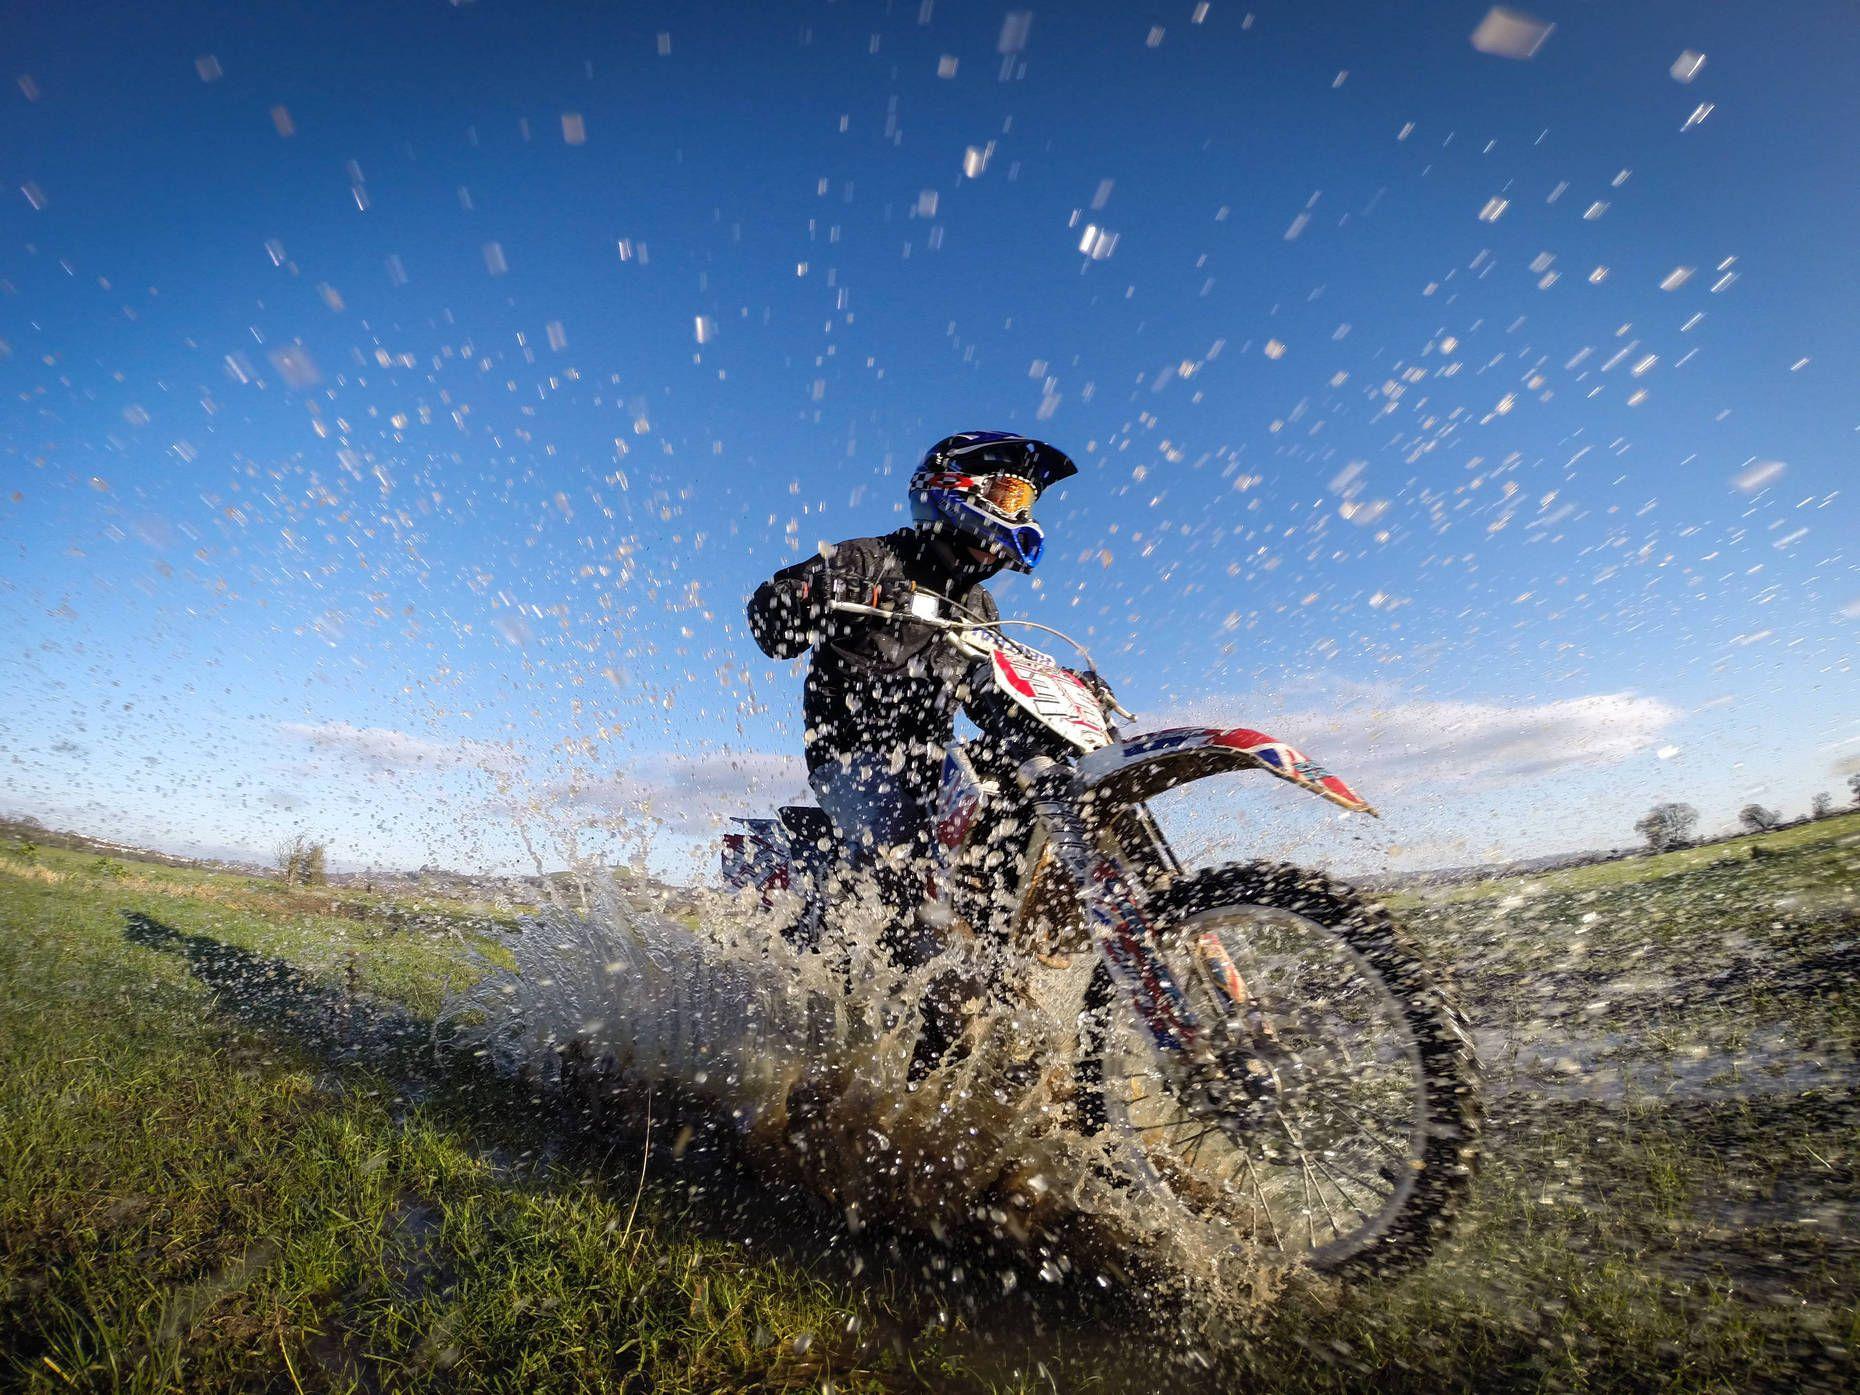 Moto Ride Through The Floodwaters Of Glastonbury Photo By Matt - 33 incredible photos taken gopro